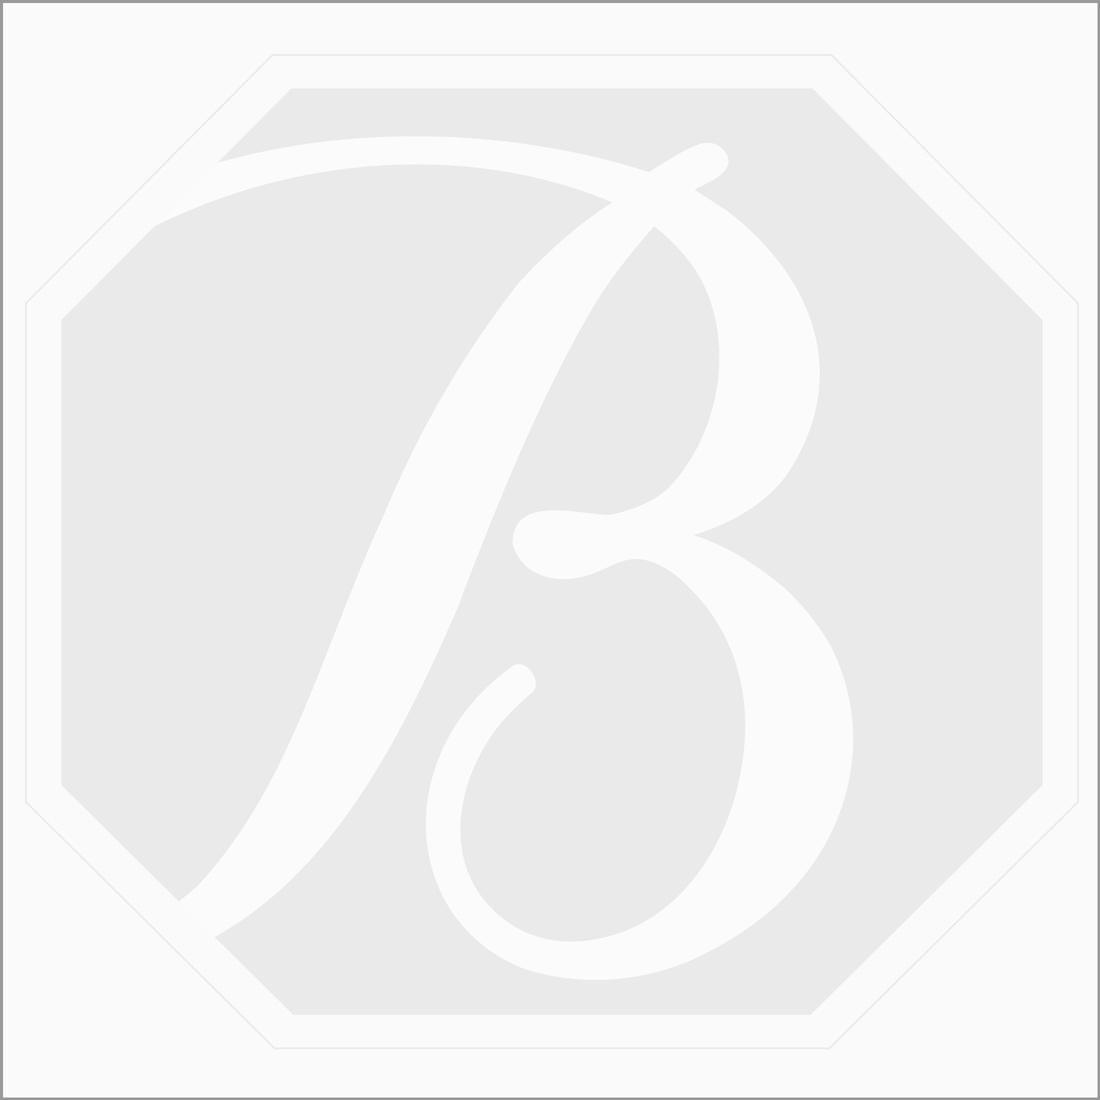 2 Brown Diamond Cushion Shape Rose Cut Diamonds - 2.80 cts. (DRC1263)